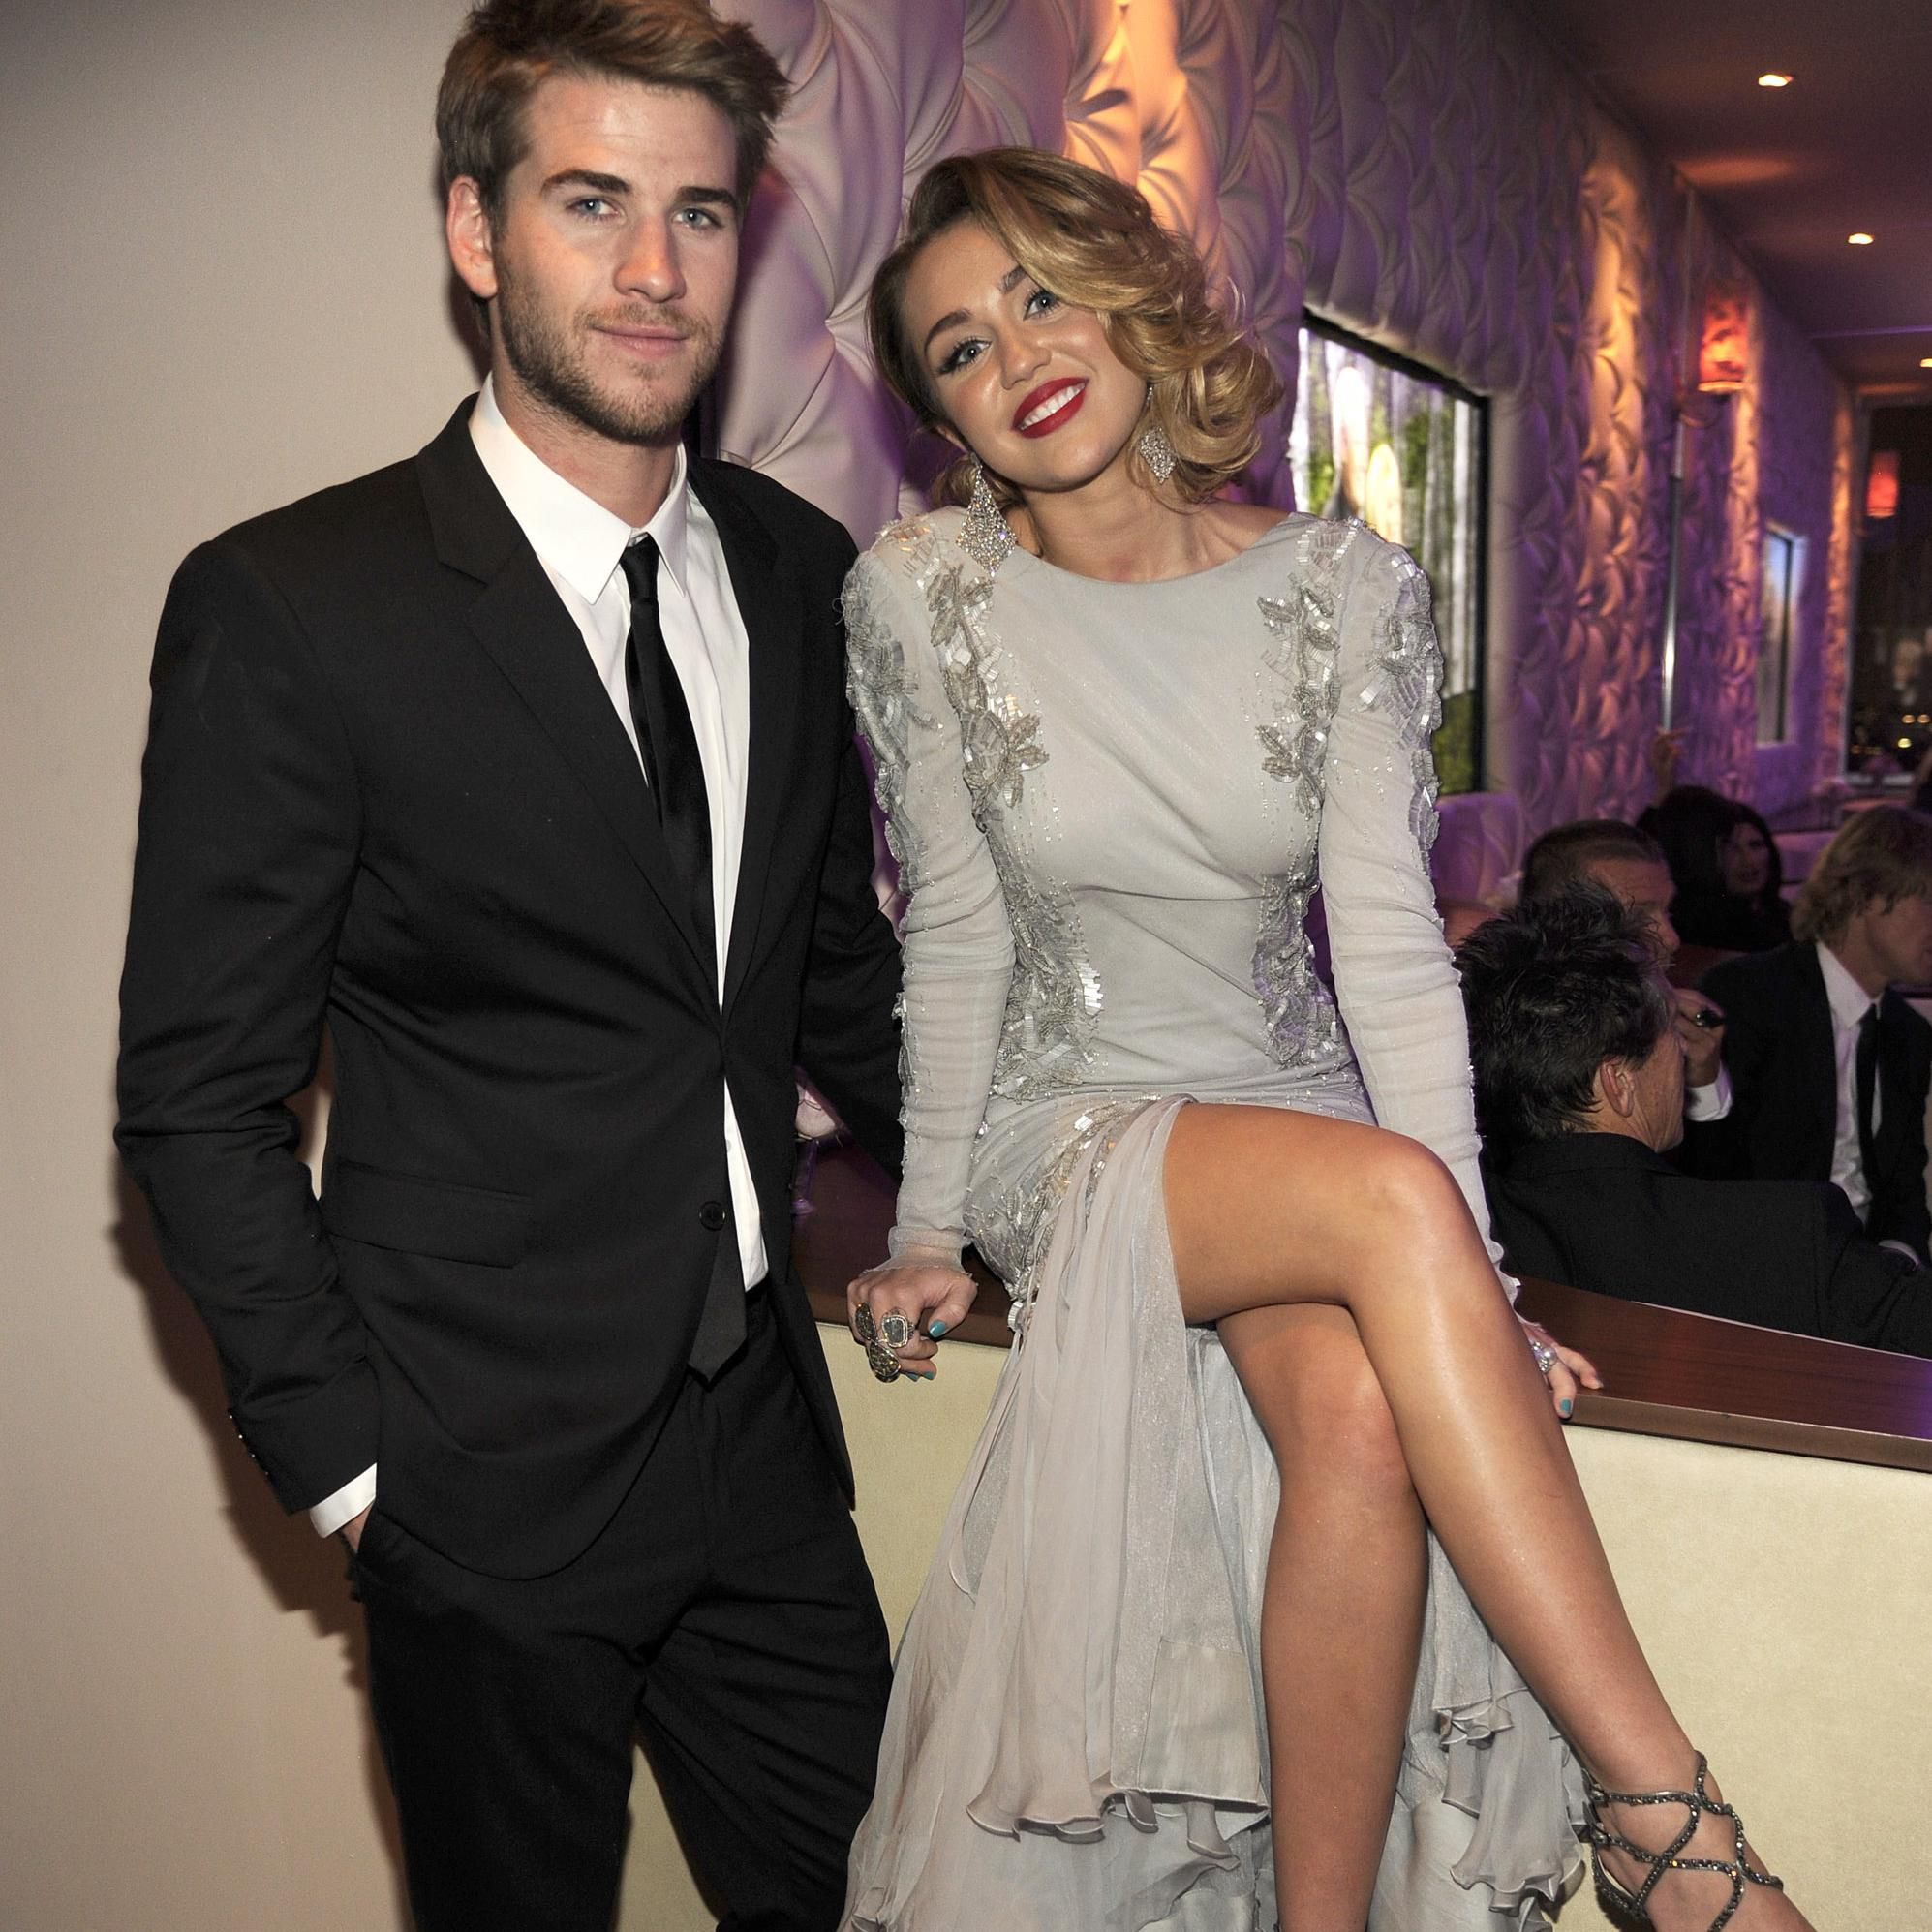 Miley Cyrus And Liam Hemsworth Reportedly Threw A Secret New Year S Eve Wedding